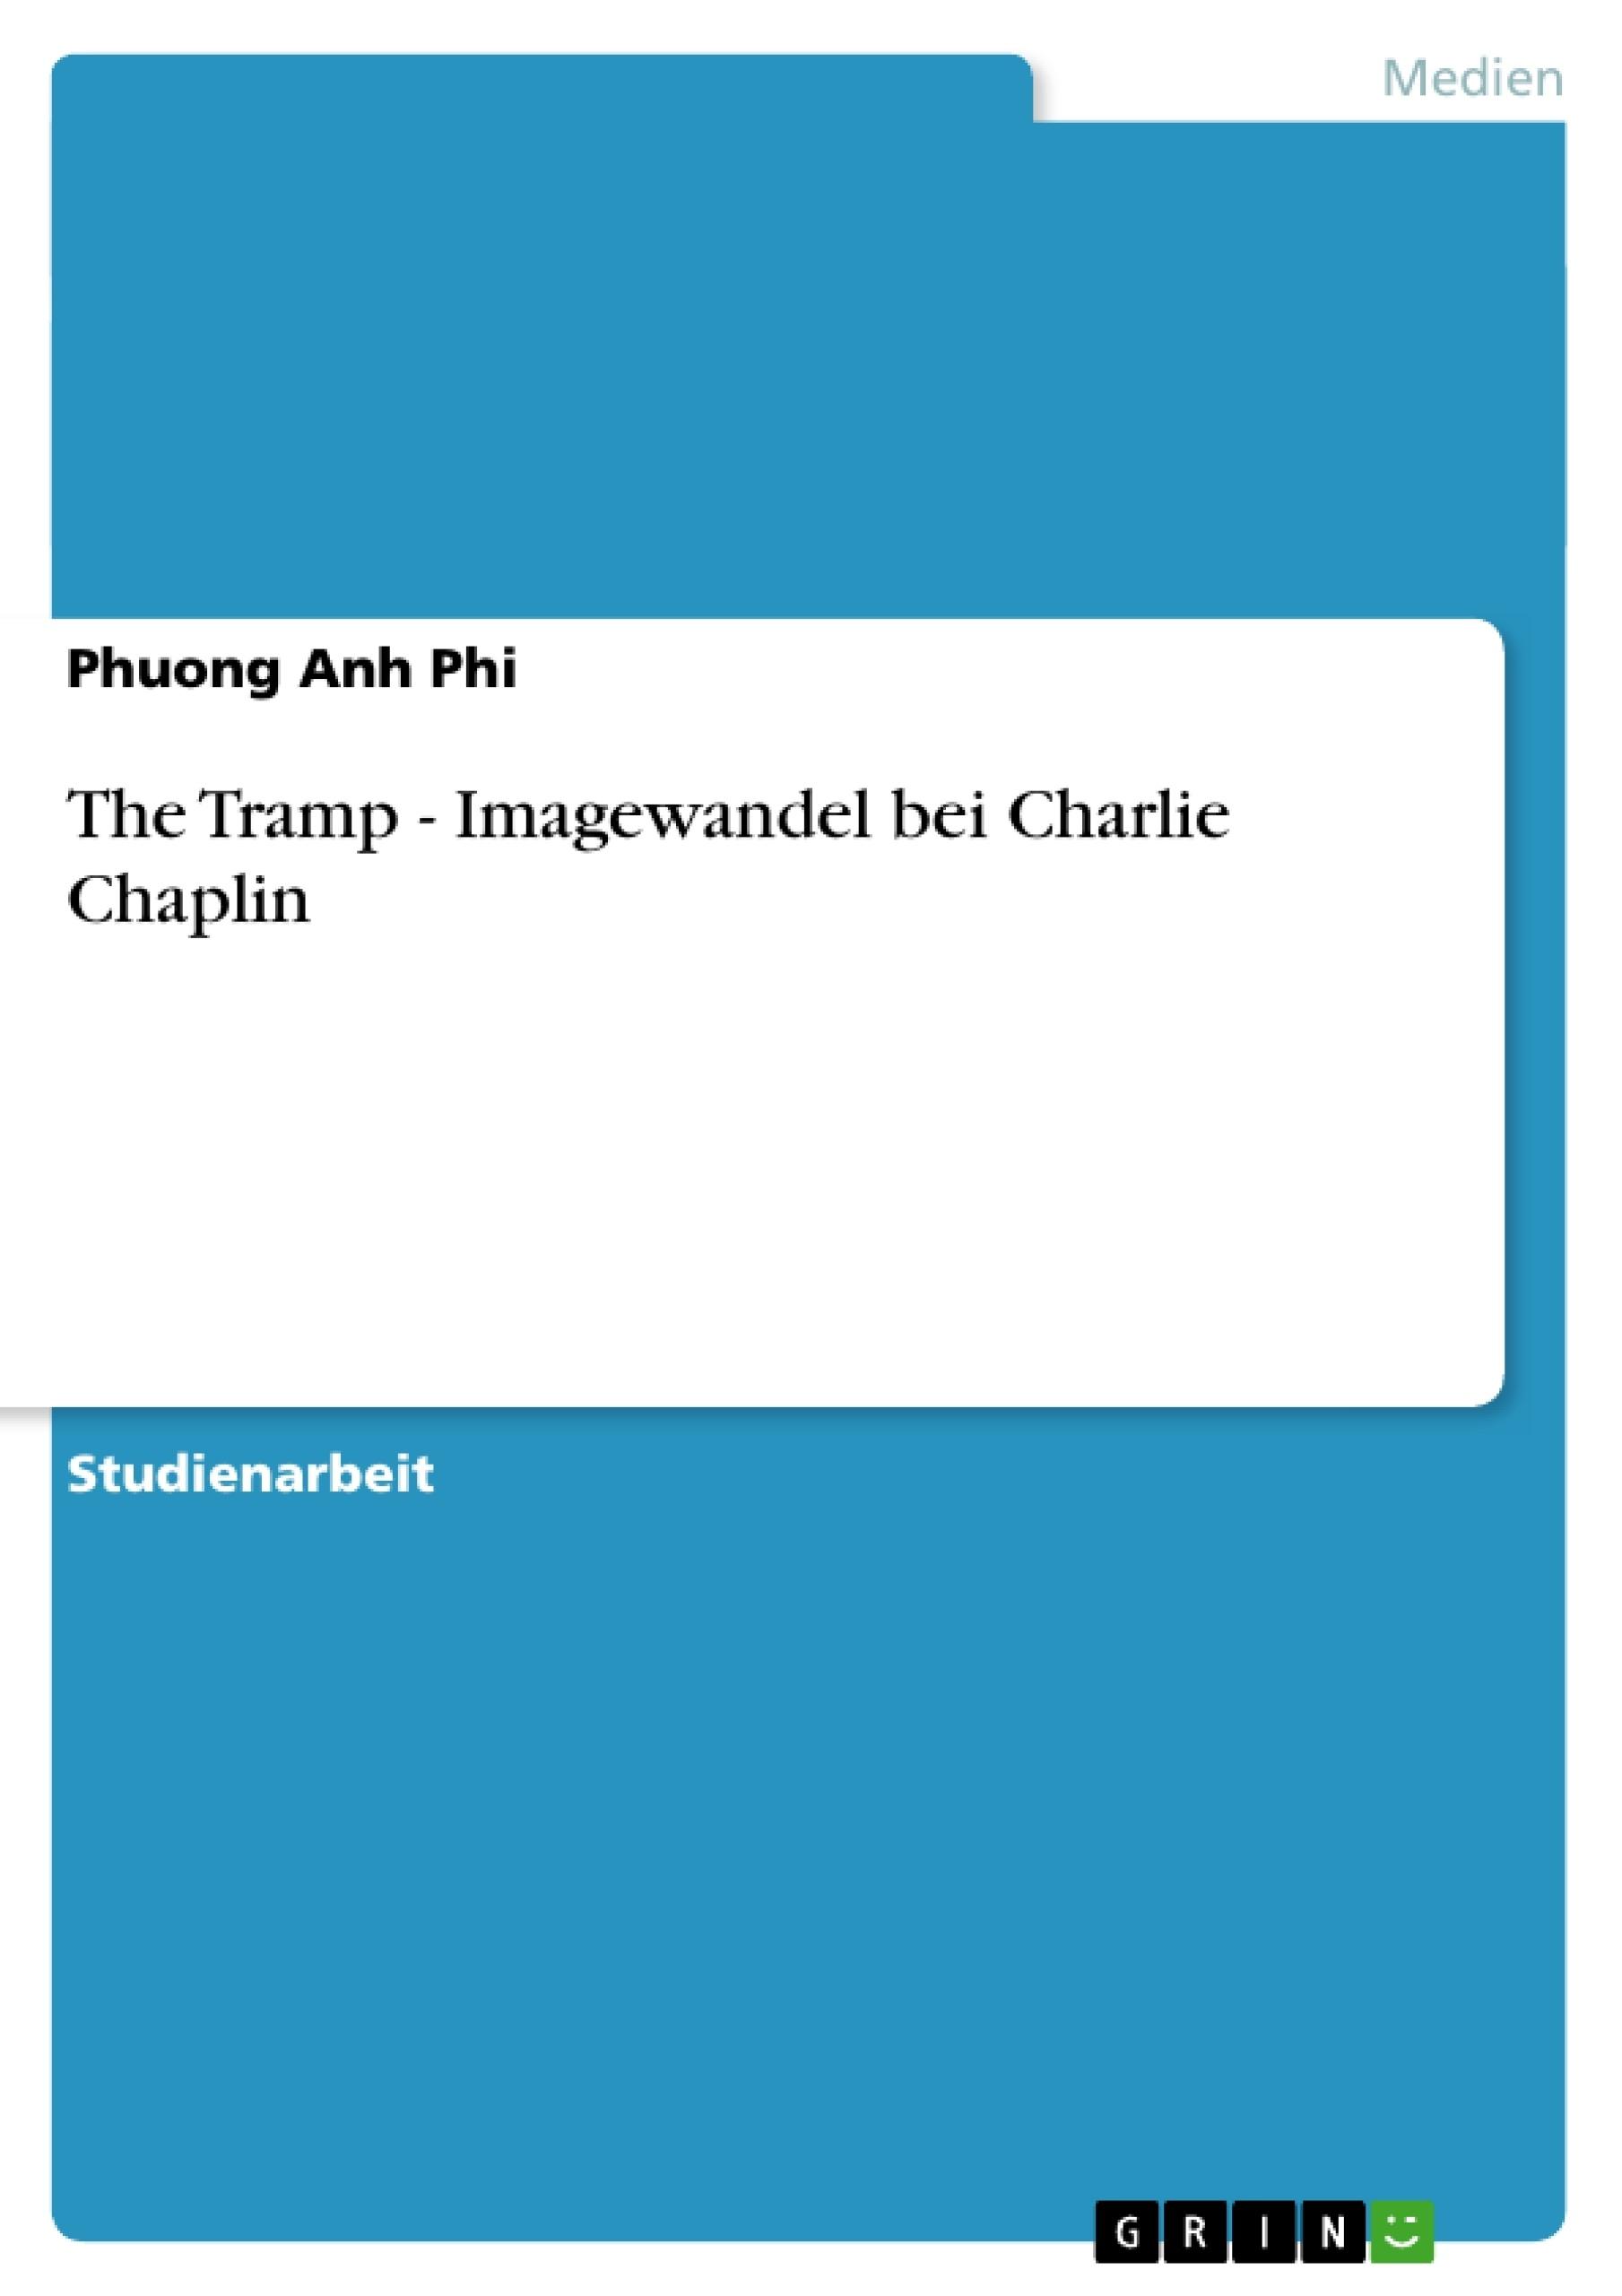 Titel: The Tramp - Imagewandel bei Charlie Chaplin